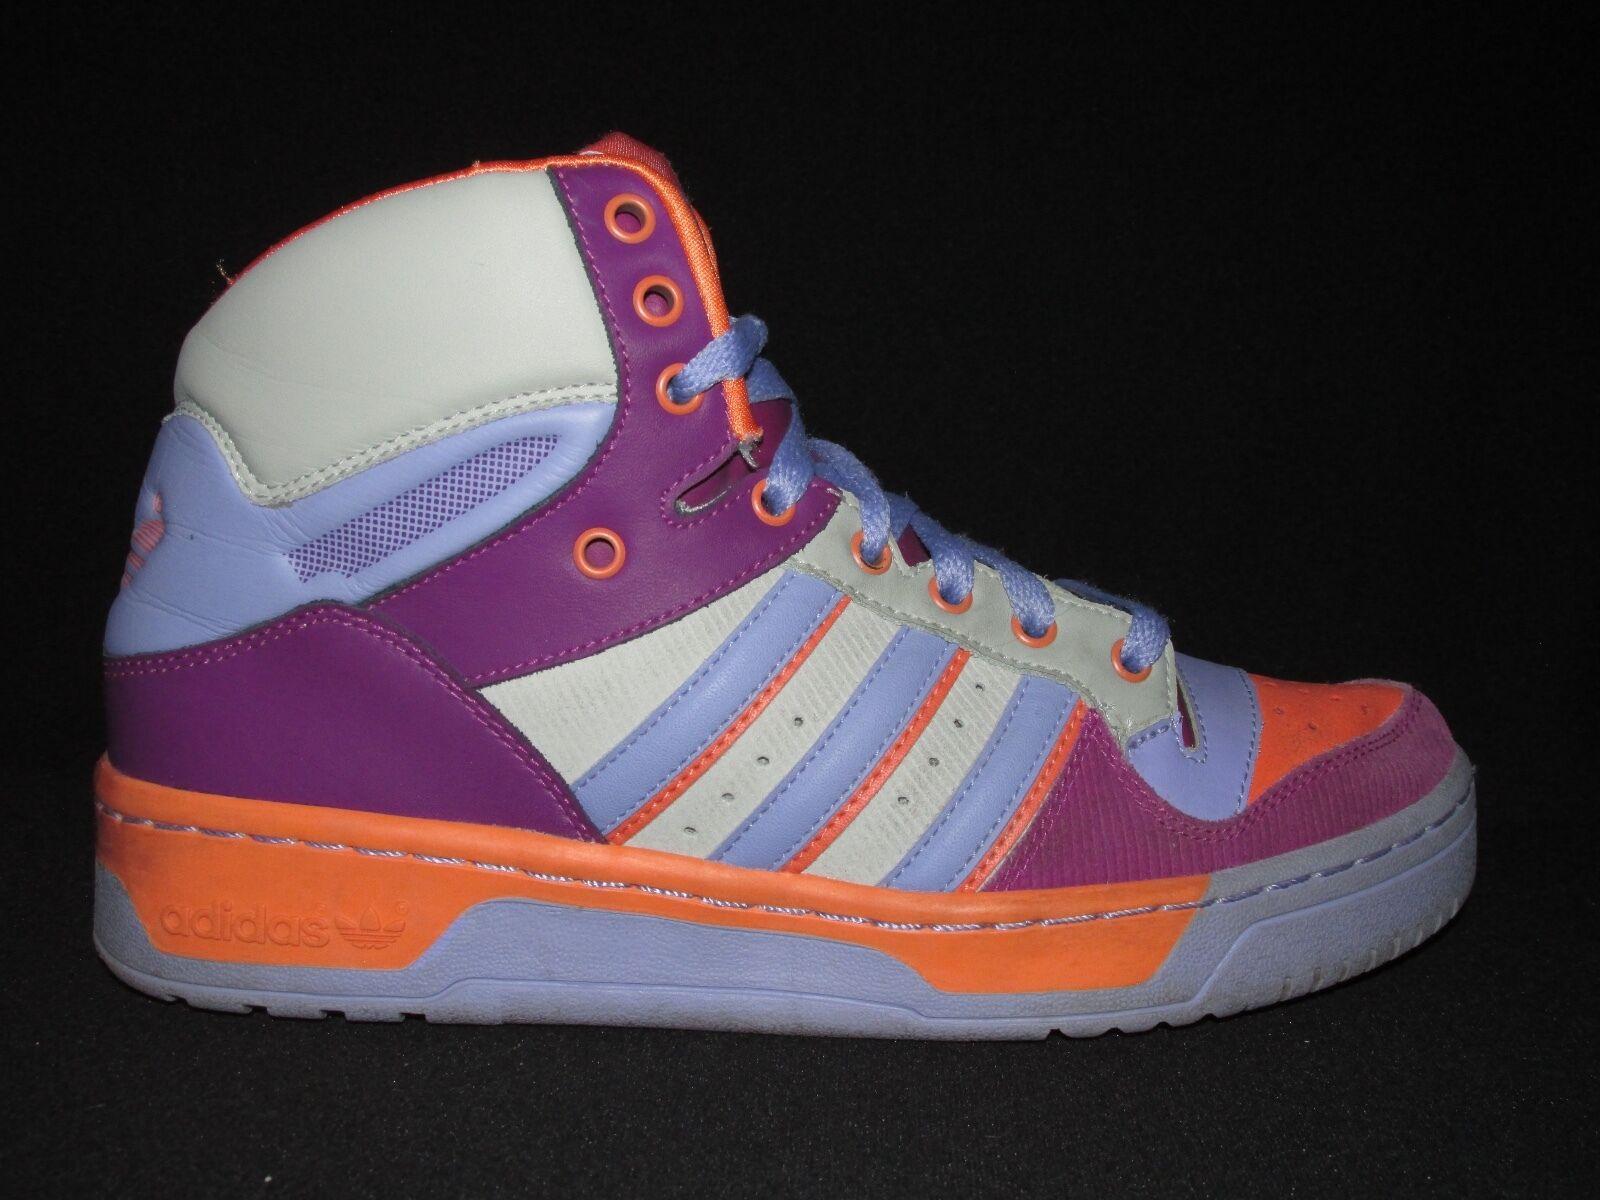 Adidas 2009 Trefoil Lavender orange Wine Hi-Top Fashion Basketball Women's US 9M